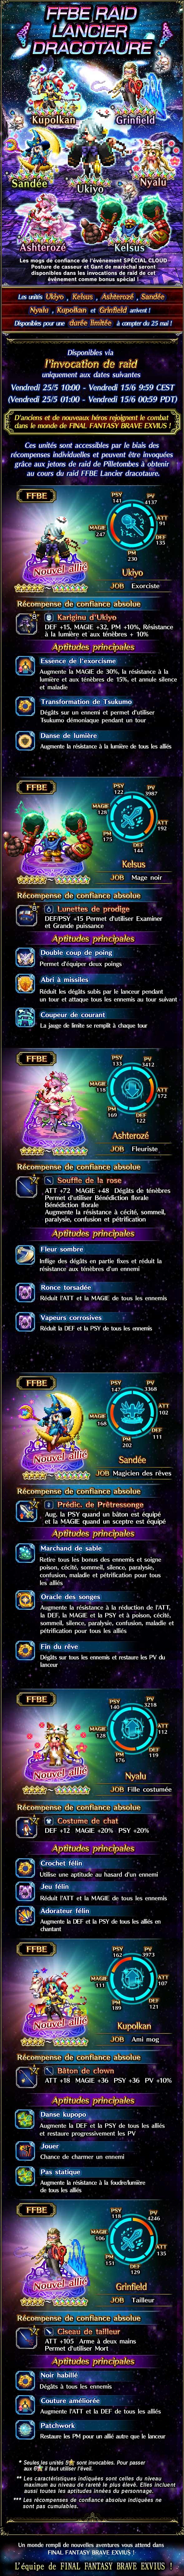 Invocations de raid - FFBE - Lancier Dragotaure DracotaurLancerUnit